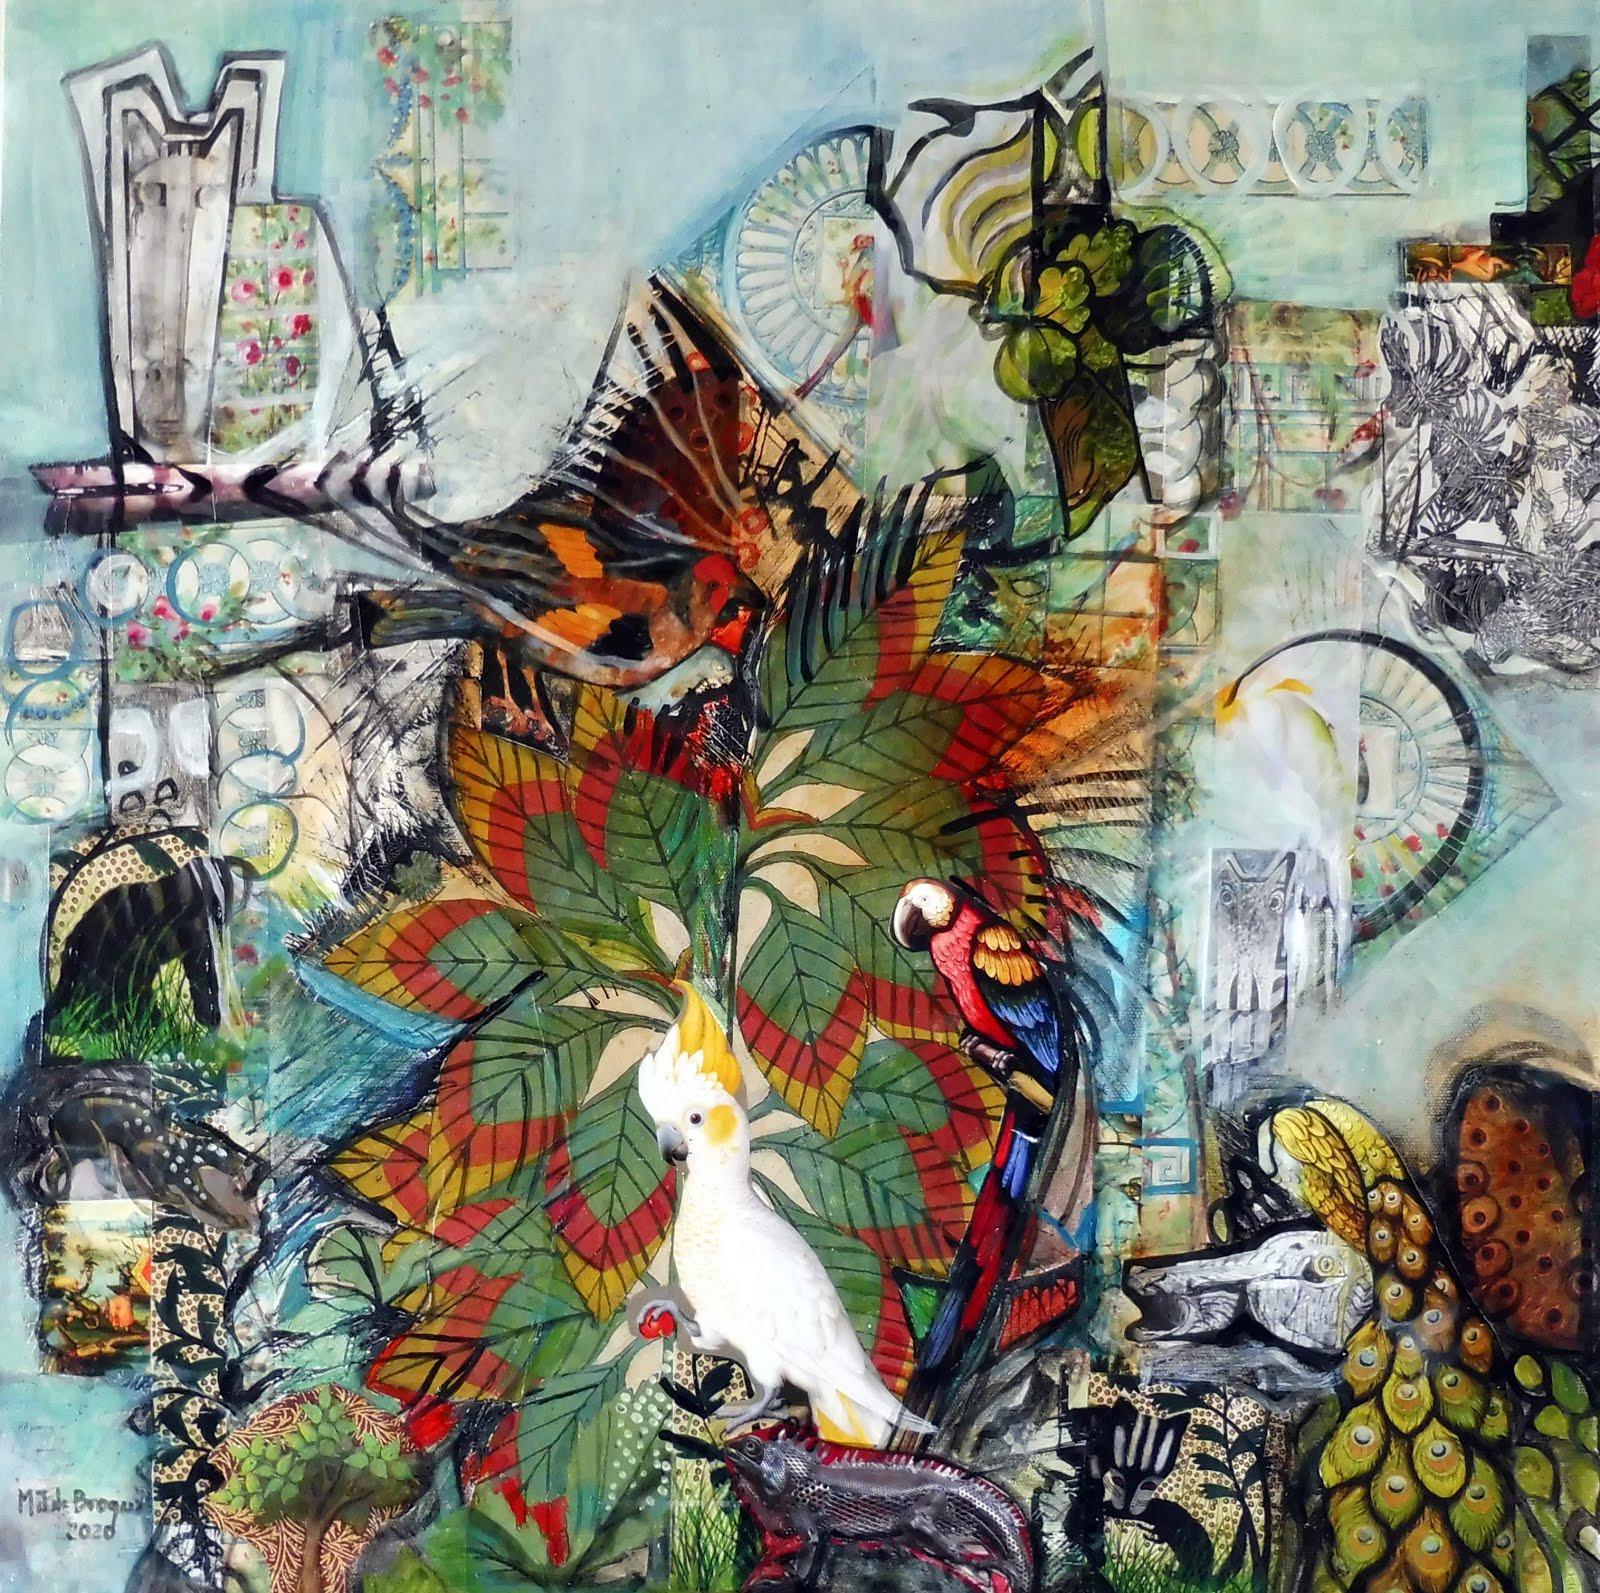 Le jardin insolite - 50 x 50 cm - 2020